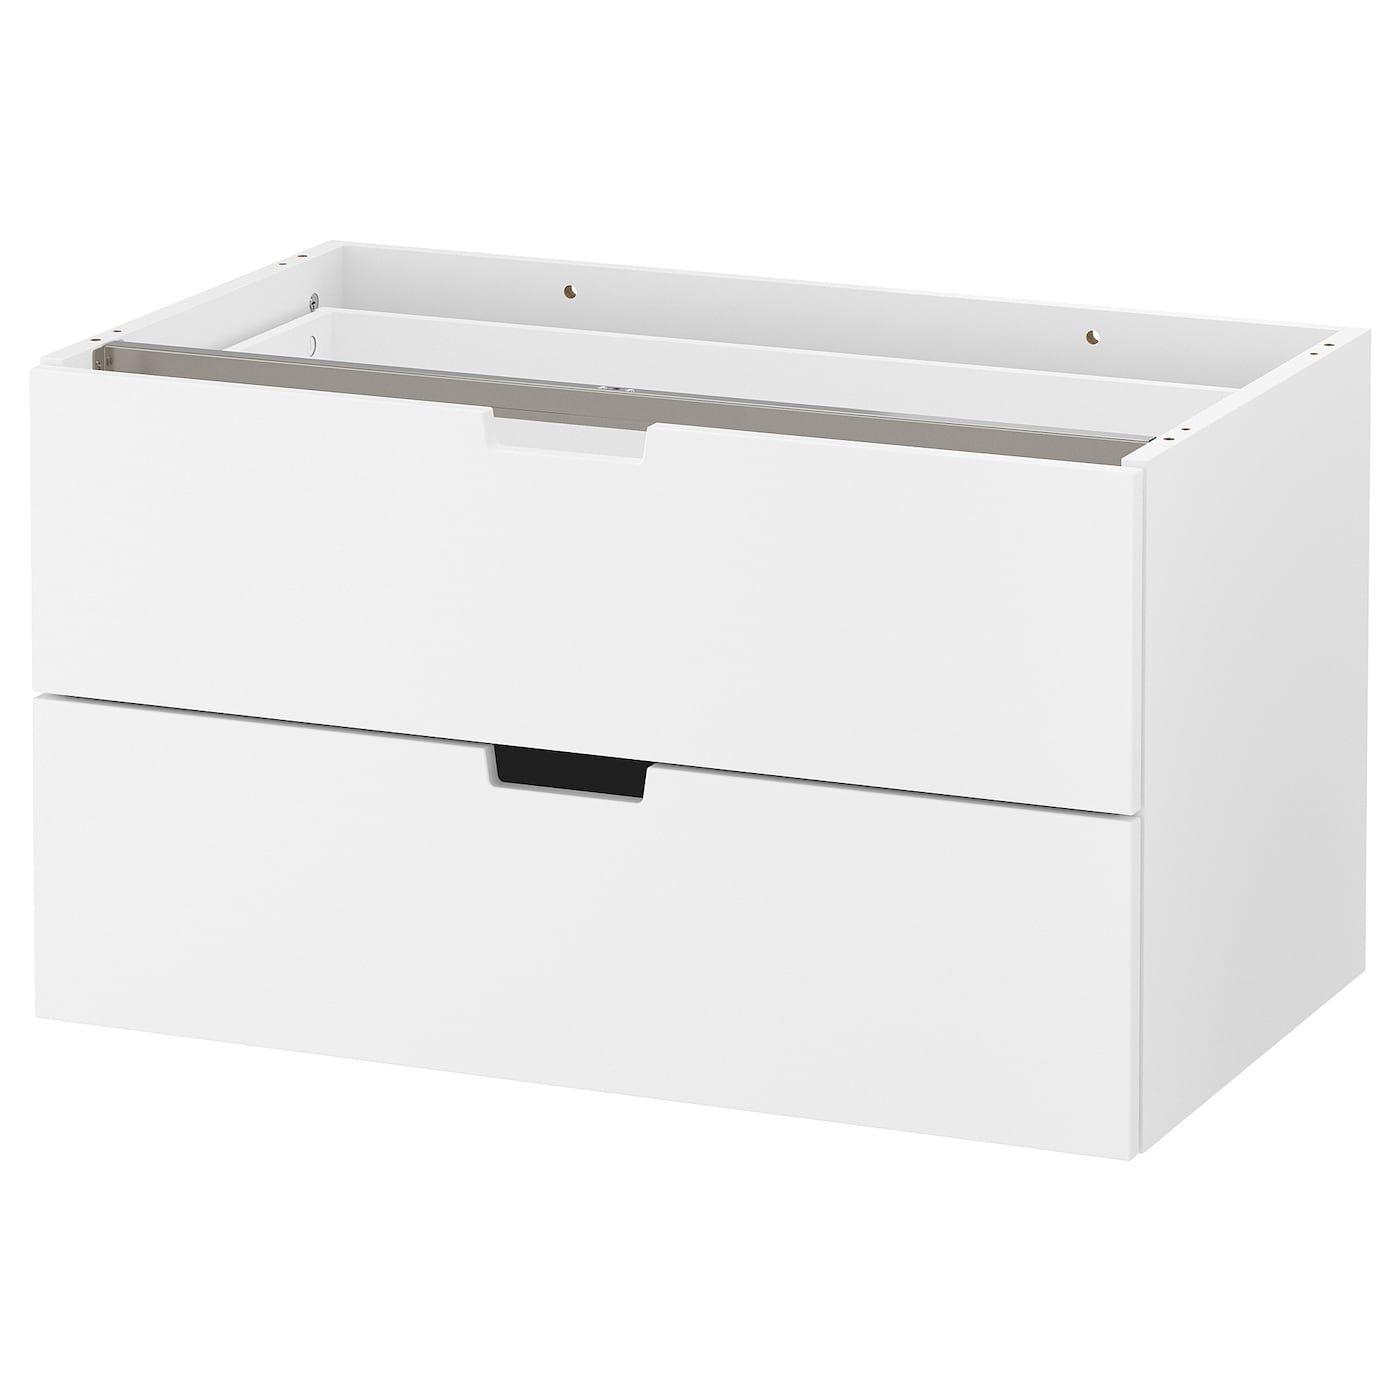 Nordli Commode Modulable 2 Tir Blanc 80x45 Cm Ikea Solutions De Rangement Idee Douche